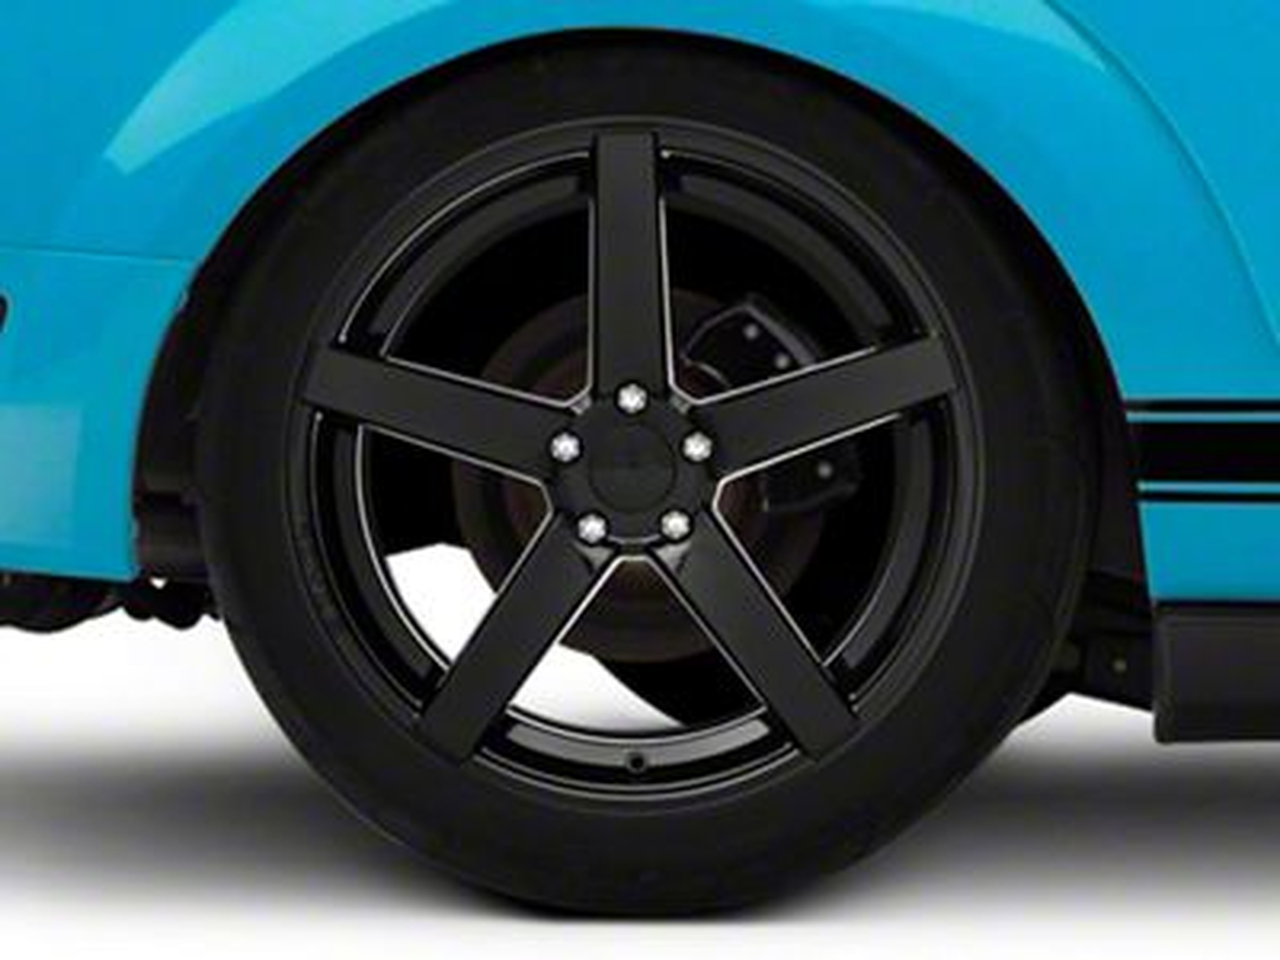 Rovos Durban Gloss Black Wheel - 20x10 - Rear Only (05-14 All)